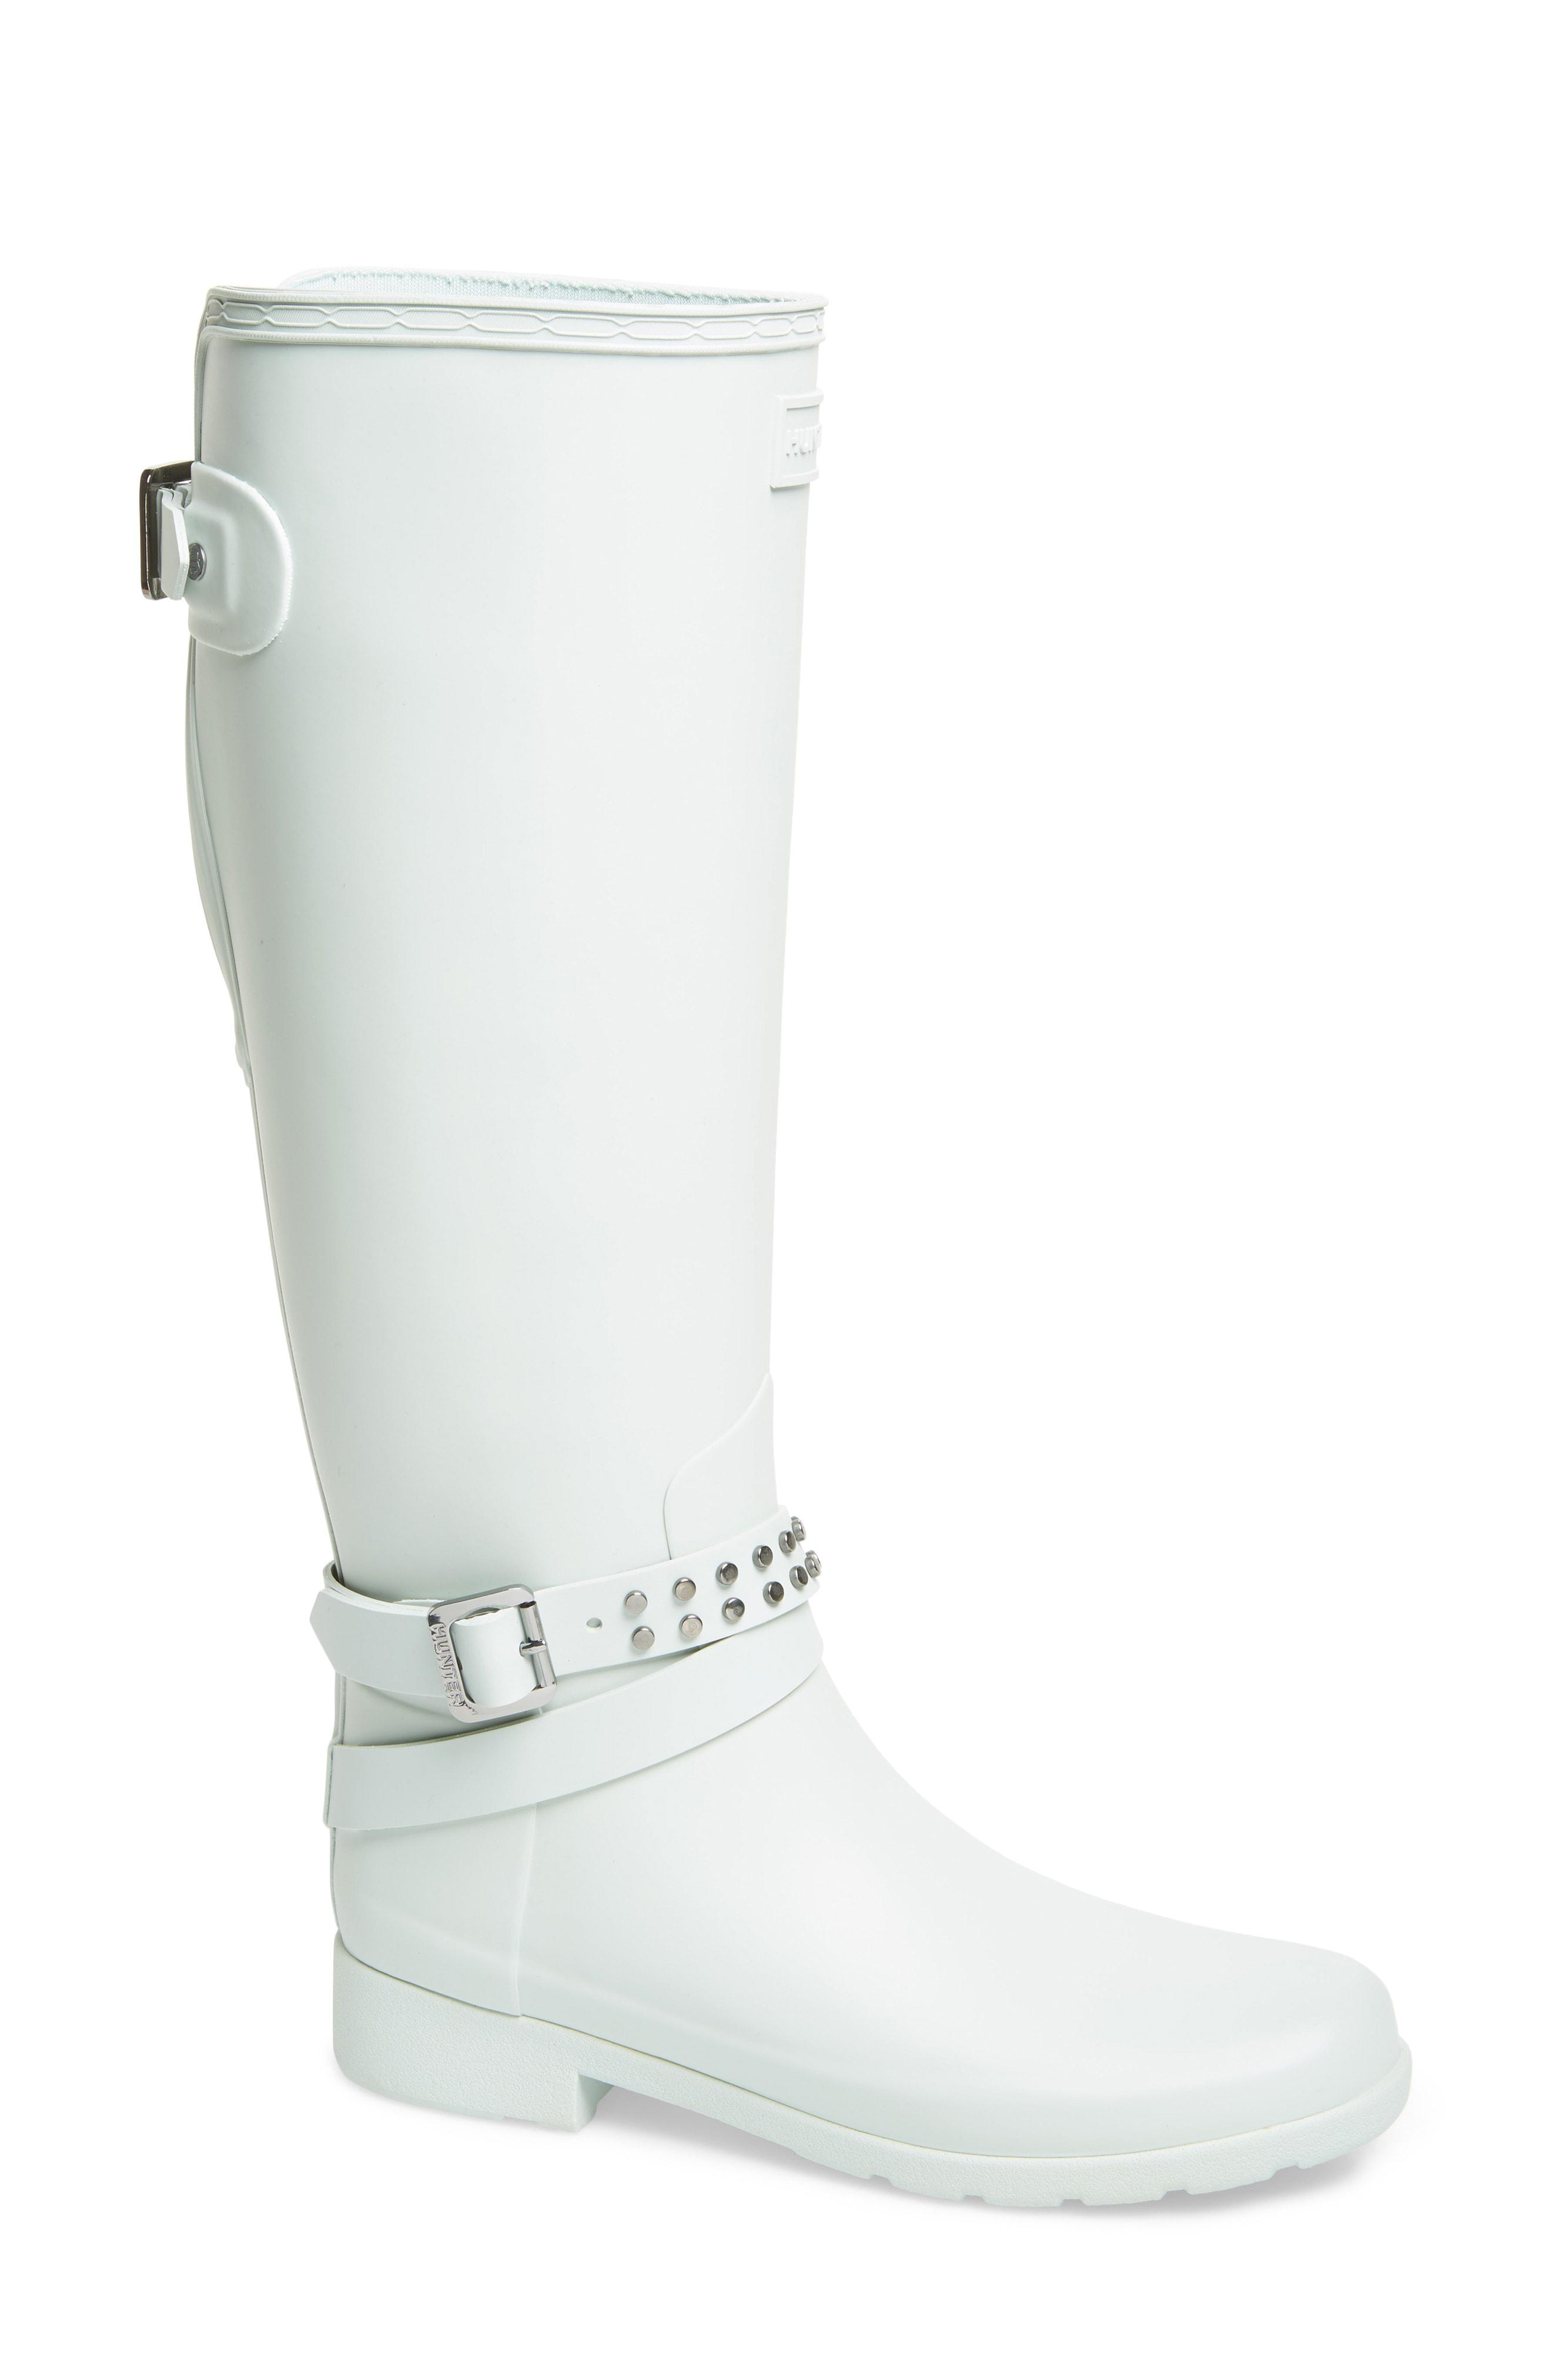 4058700f1 HUNTER Refined Adjustable Back Knee High Waterproof Rain Boot in ...